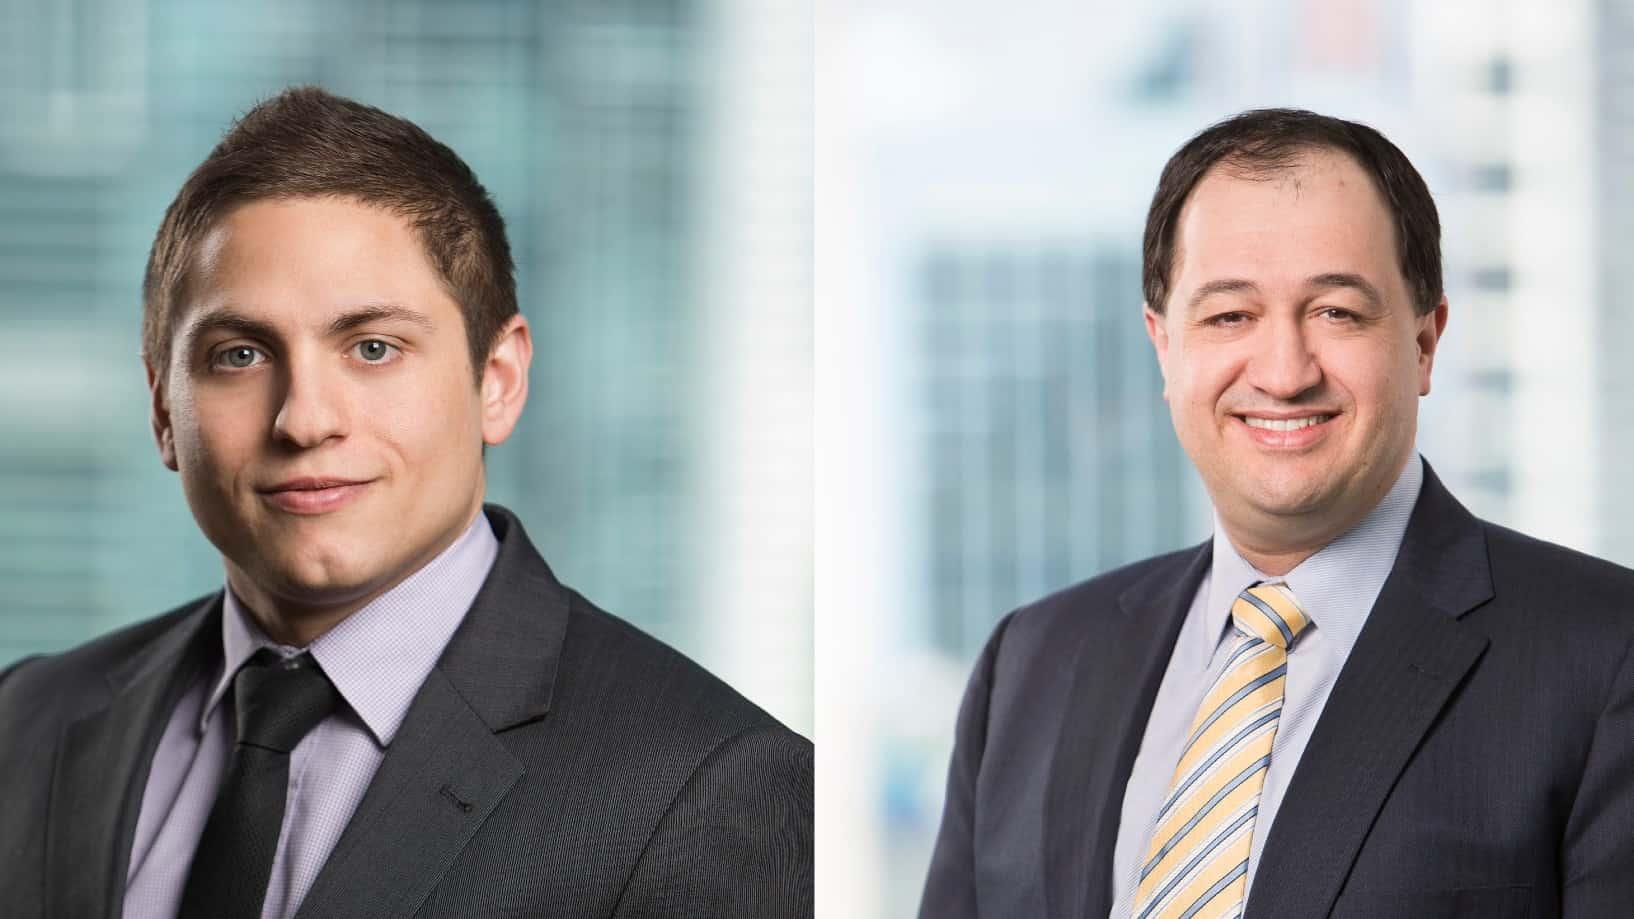 Nikko Asset Management fund managers Darren Langer and Chris Rands